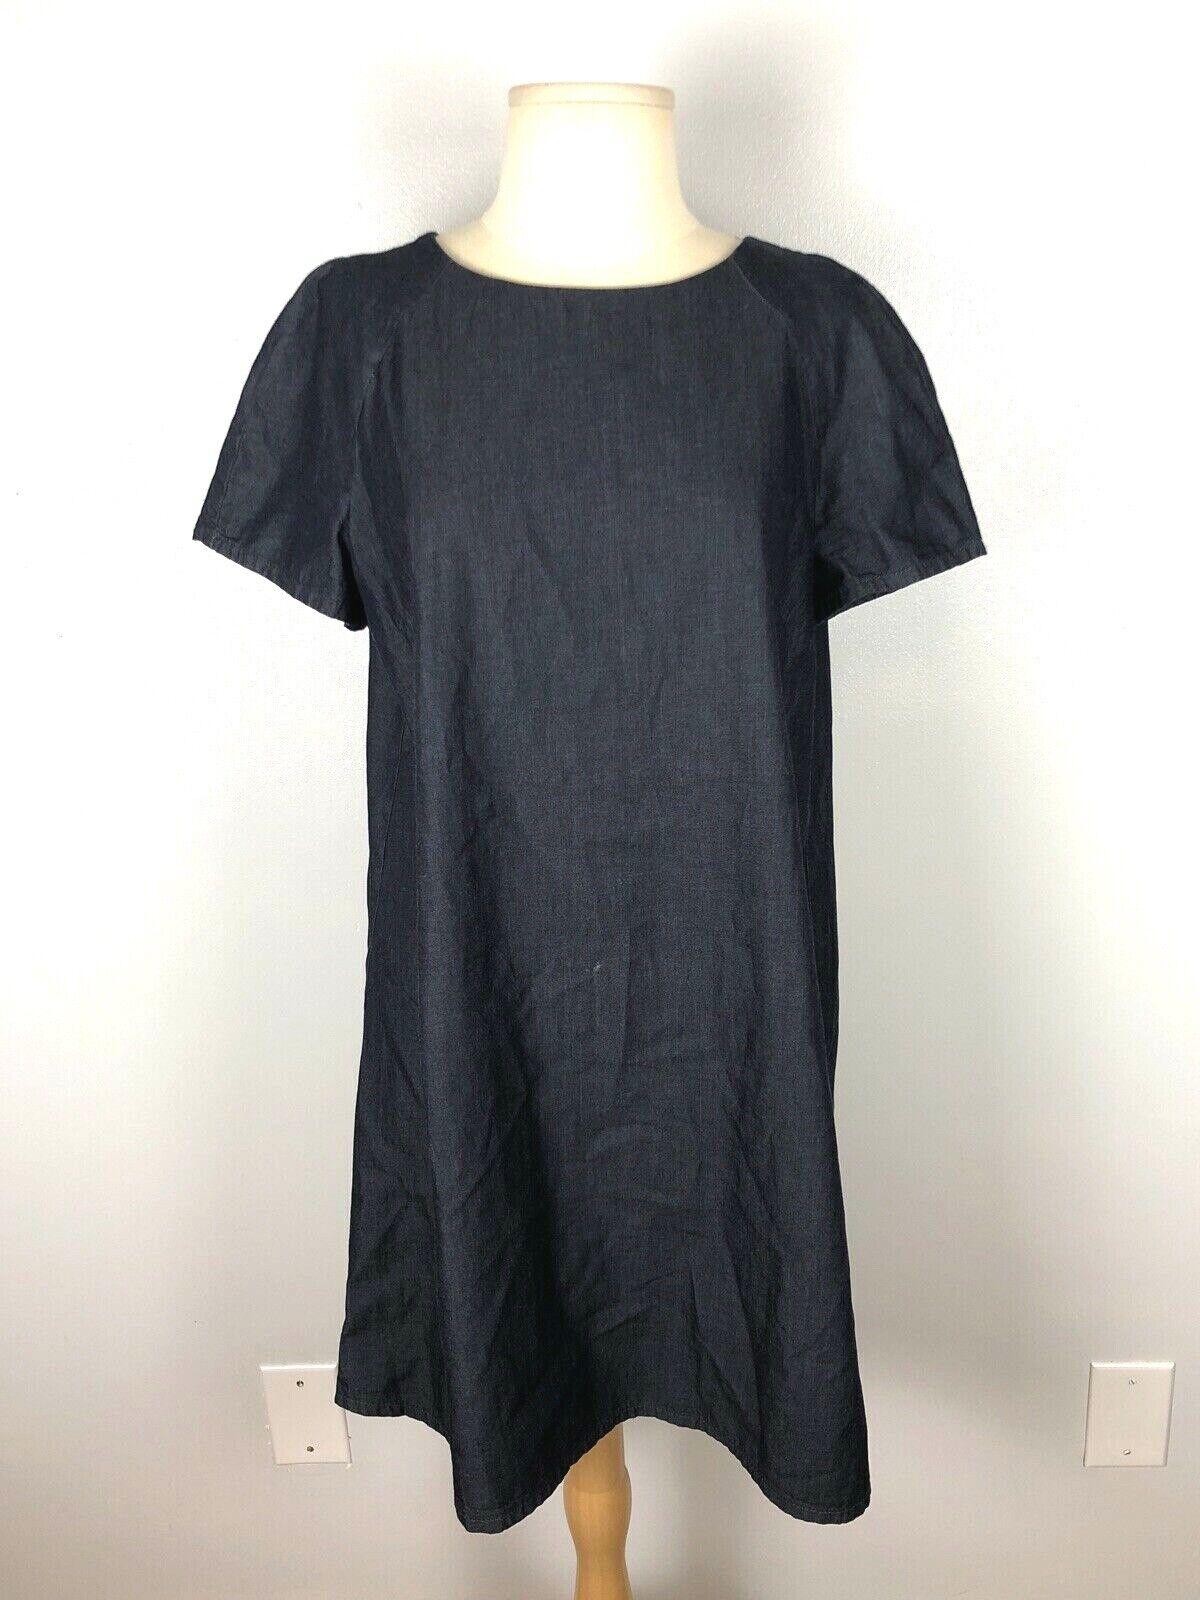 Zara Basic Denim Dark Wash Swing Dress, Size L - image 2